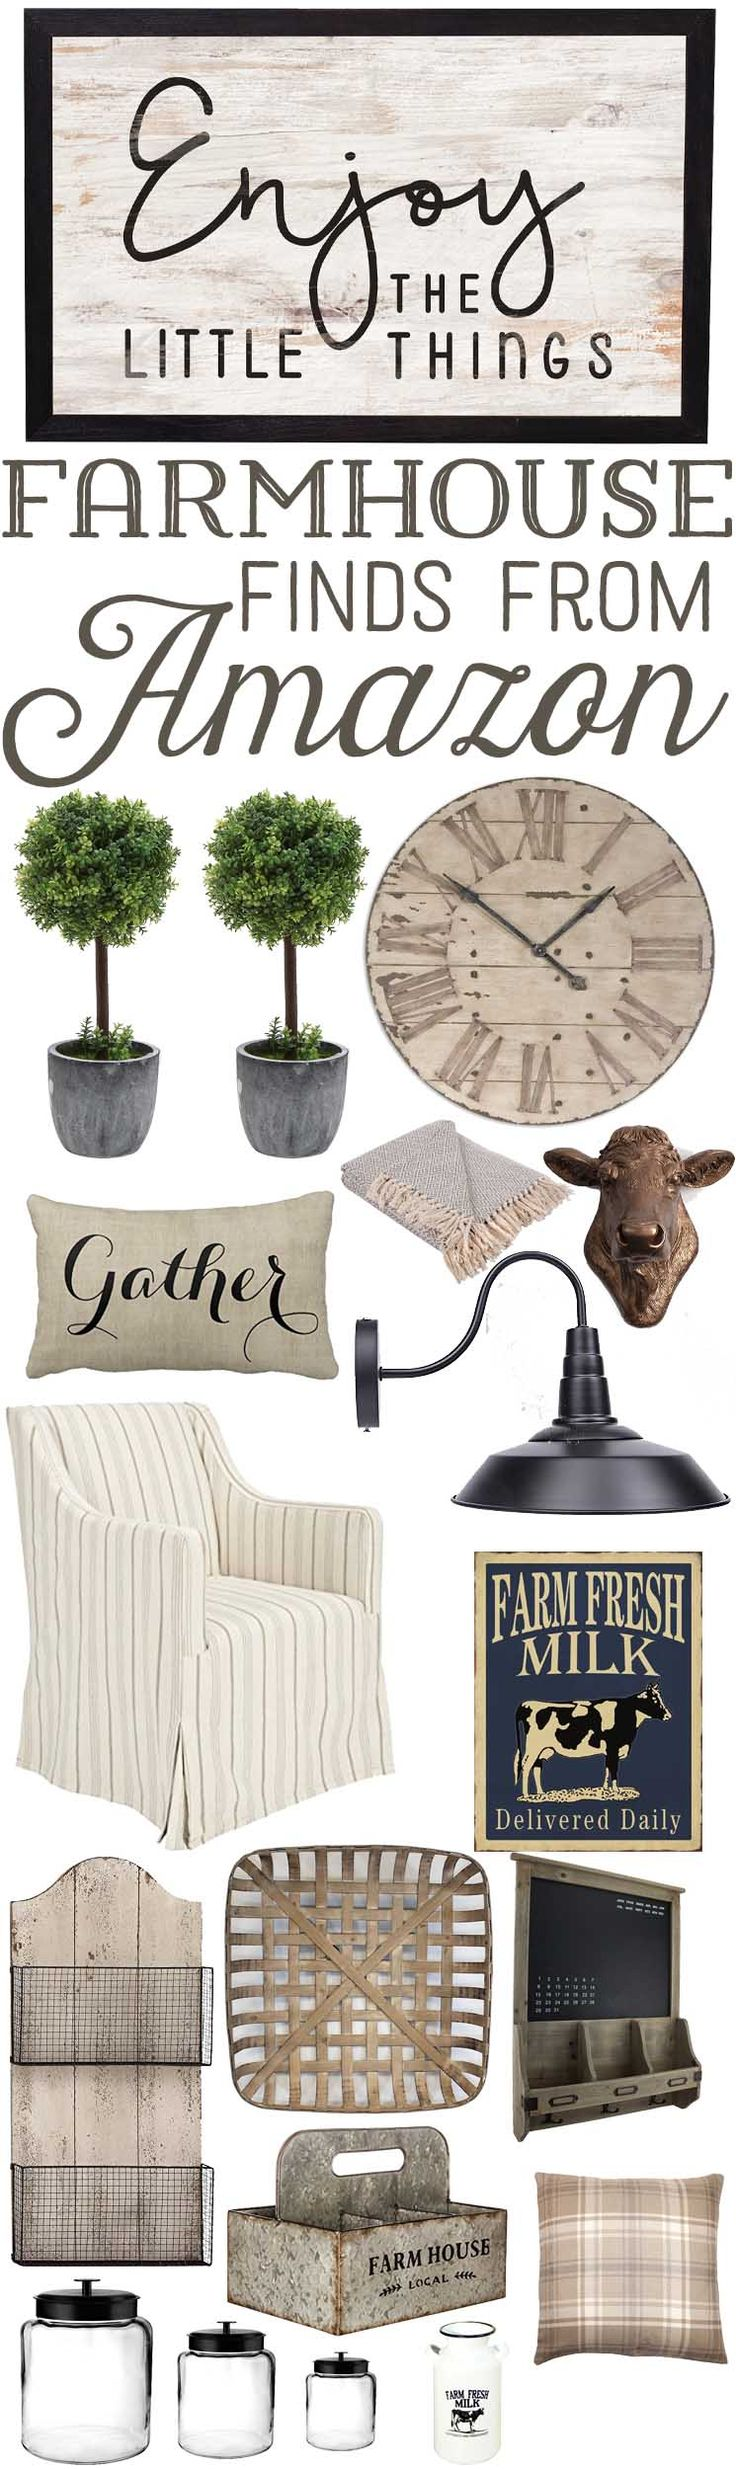 Farmhouse Finds From Amazon-Farmhouse Decor-farmhouse wall decor-farmouse decorating ideas.jpg